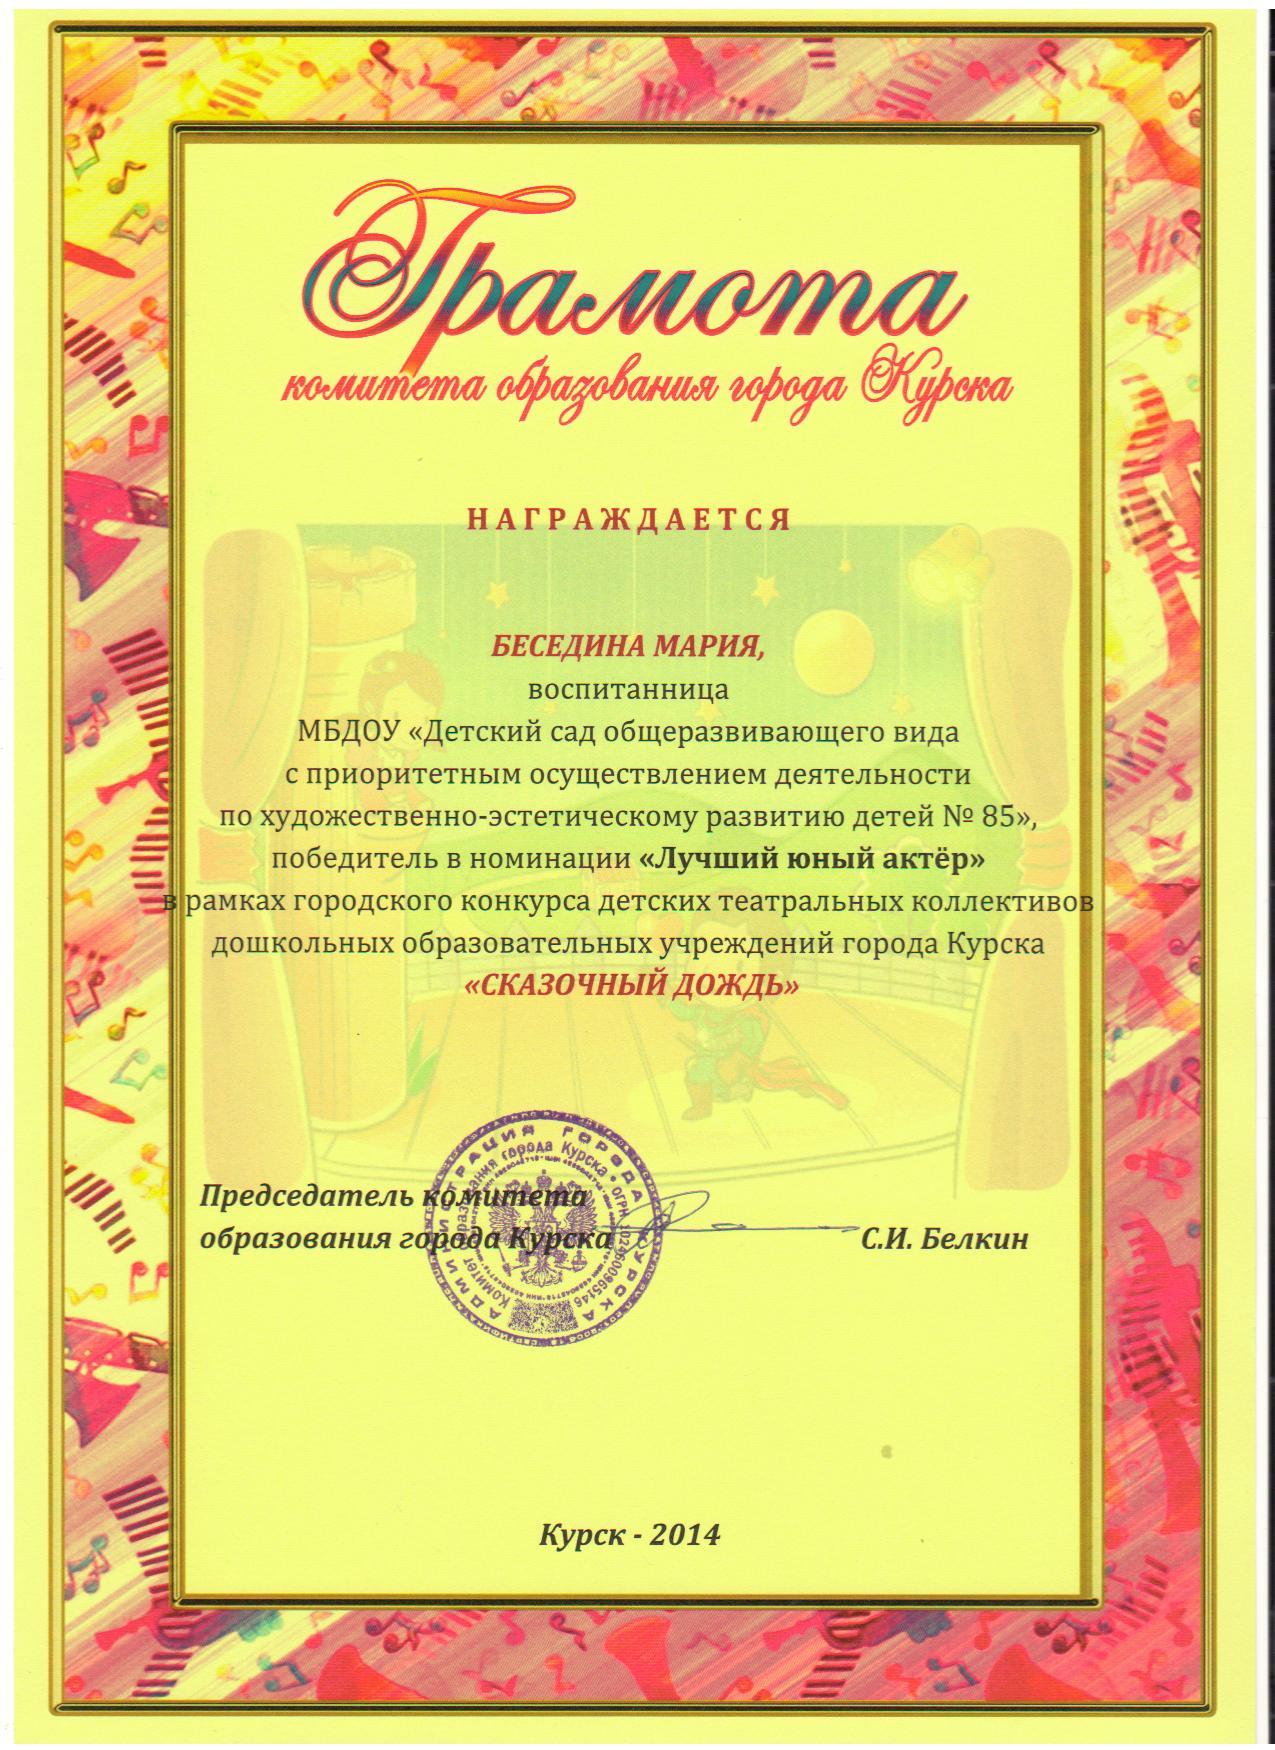 грамота дождь 2014 31.03.2014-8